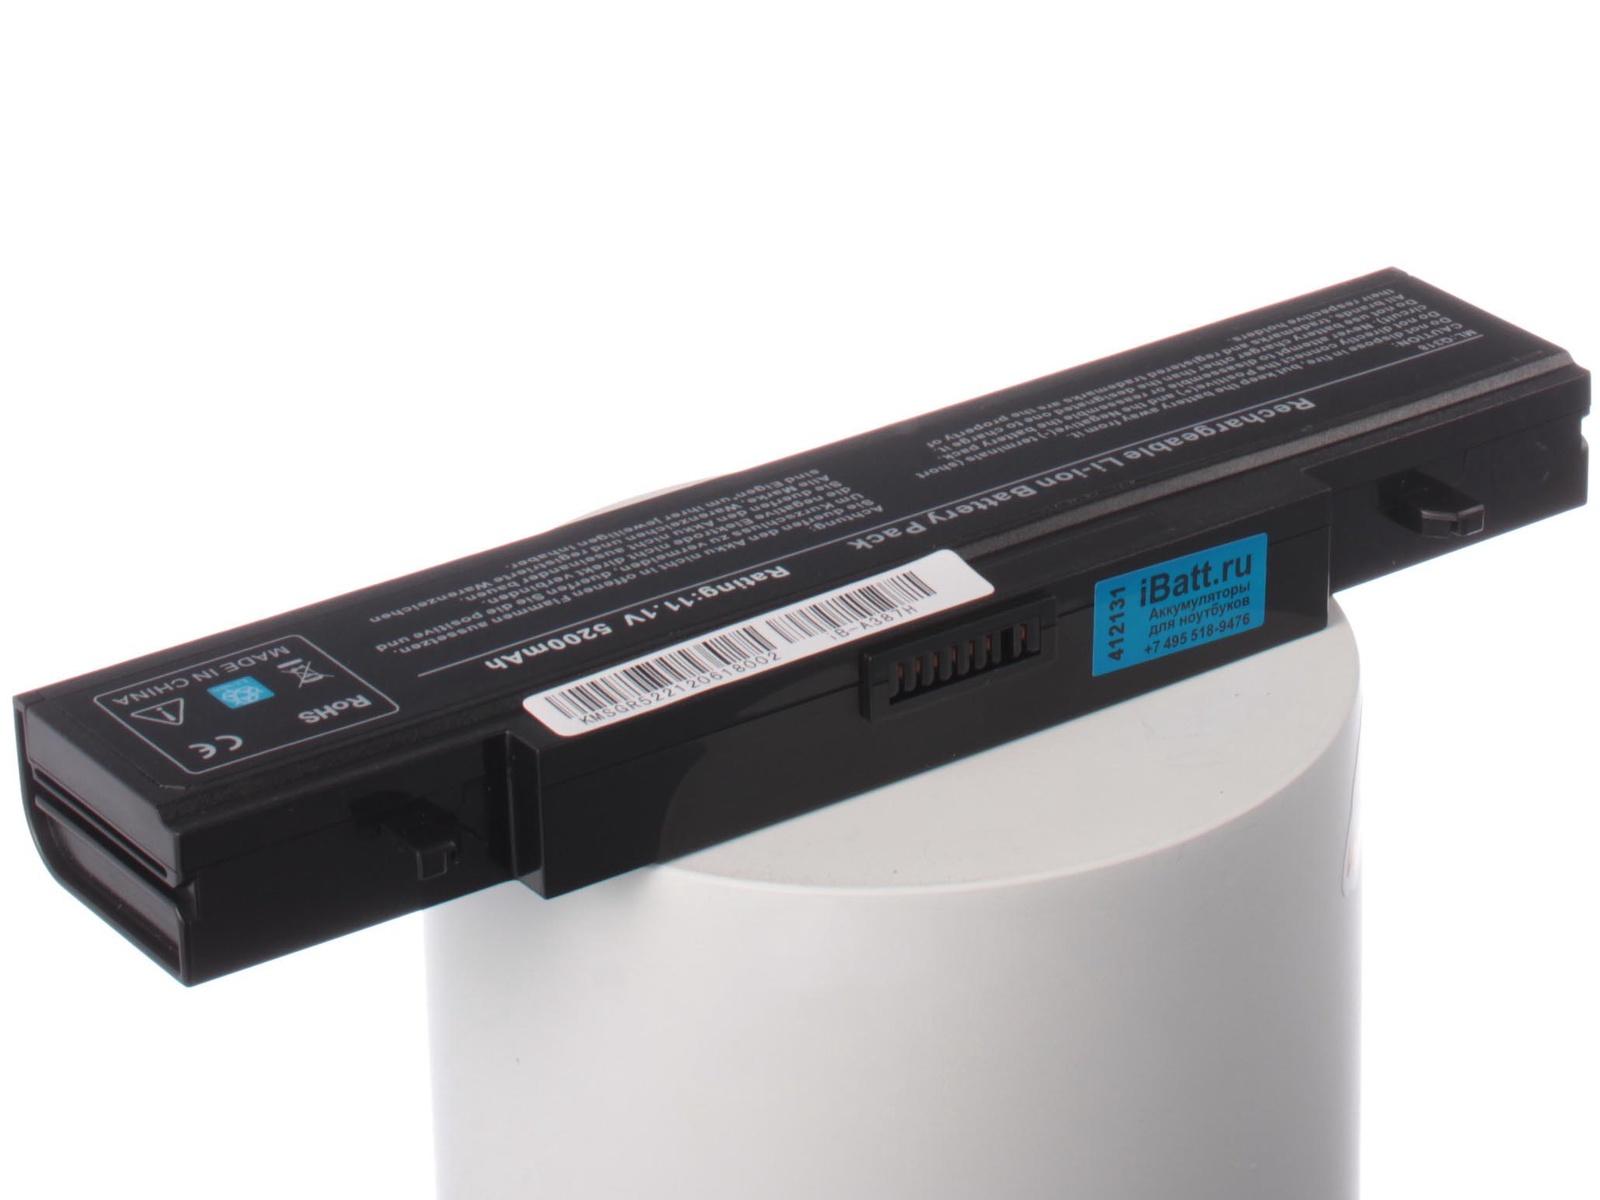 Аккумулятор для ноутбука iBatt для Samsung RV508-S01, R525-JS03, 270E5E-X05, 350E5C-S06, R540-JS0C, R540-JT04, 355E5X-S01, R525-JT09, 300E7A-S07, Samsung 355V5X, 300E7Z-S01, NP305V4A, RC528, RV510-S01, NP-R463, R528-DA03 аккумулятор для ноутбука ibatt для samsung 355e5x rv518 rv720 350e7c 355e5c 305e7a np r590 350v5x ativ book 2 np r440l np r522 np r469 q530 q430 r423 200a5b 305v5a s0k 355v5x 355e5x a01 300e7z s02 200a4b